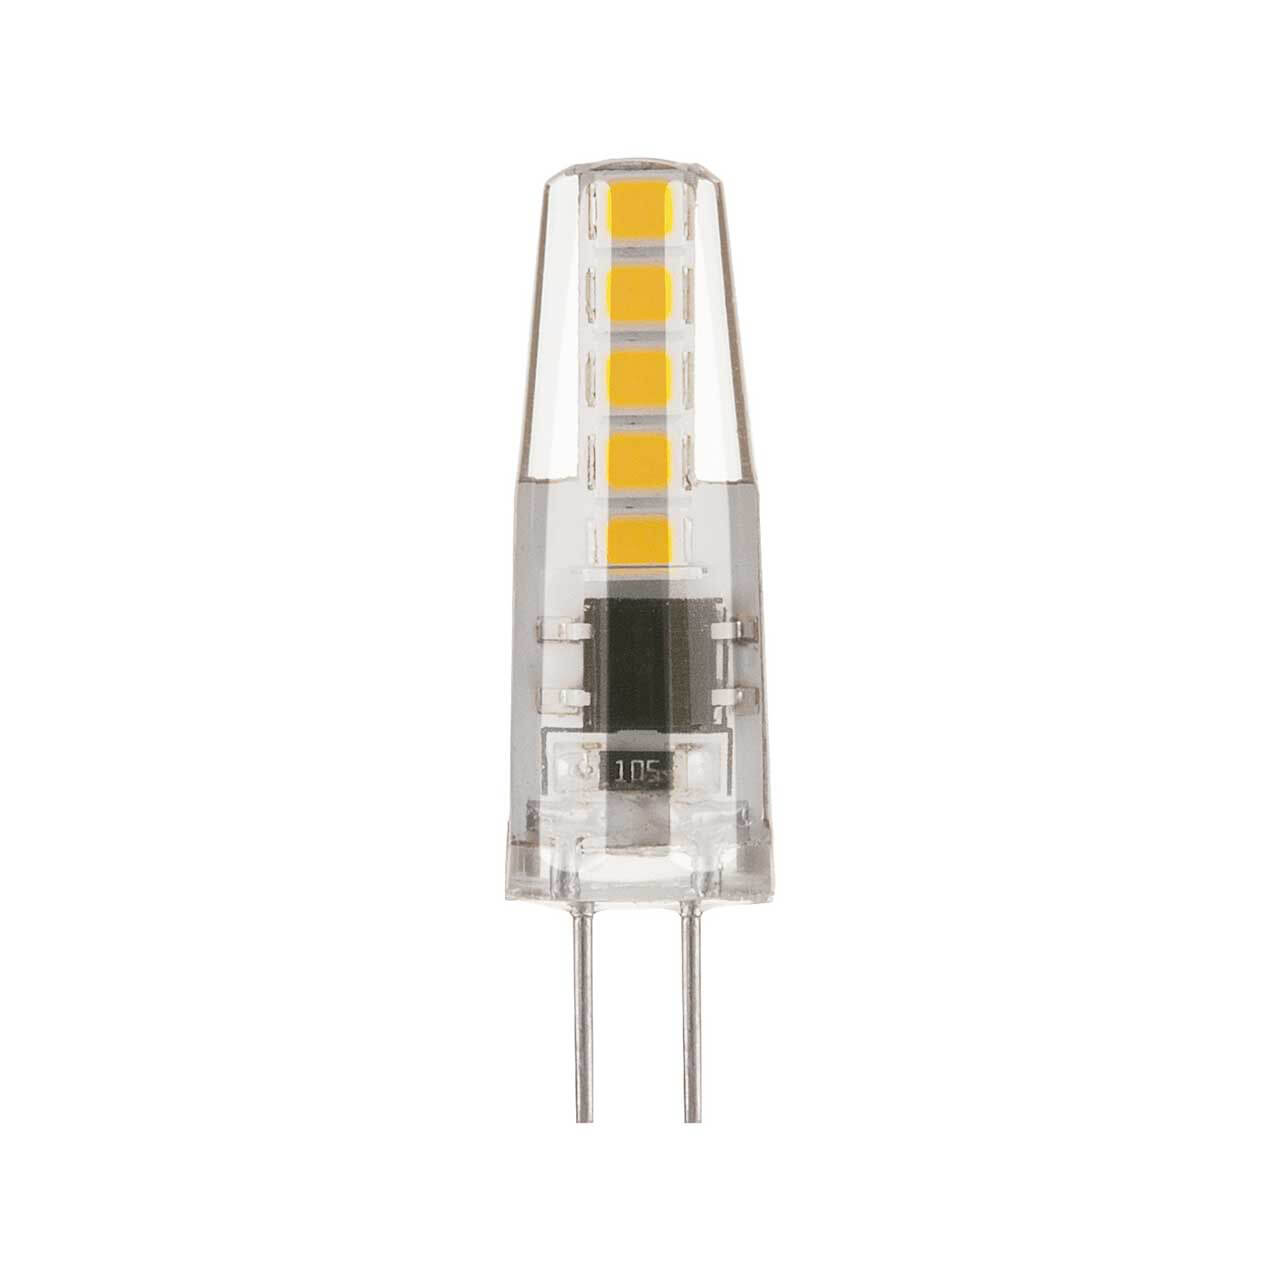 купить Лампа светодиодная Elektrostandard G4 3W 4200K прозрачная 4690389118982 по цене 139 рублей